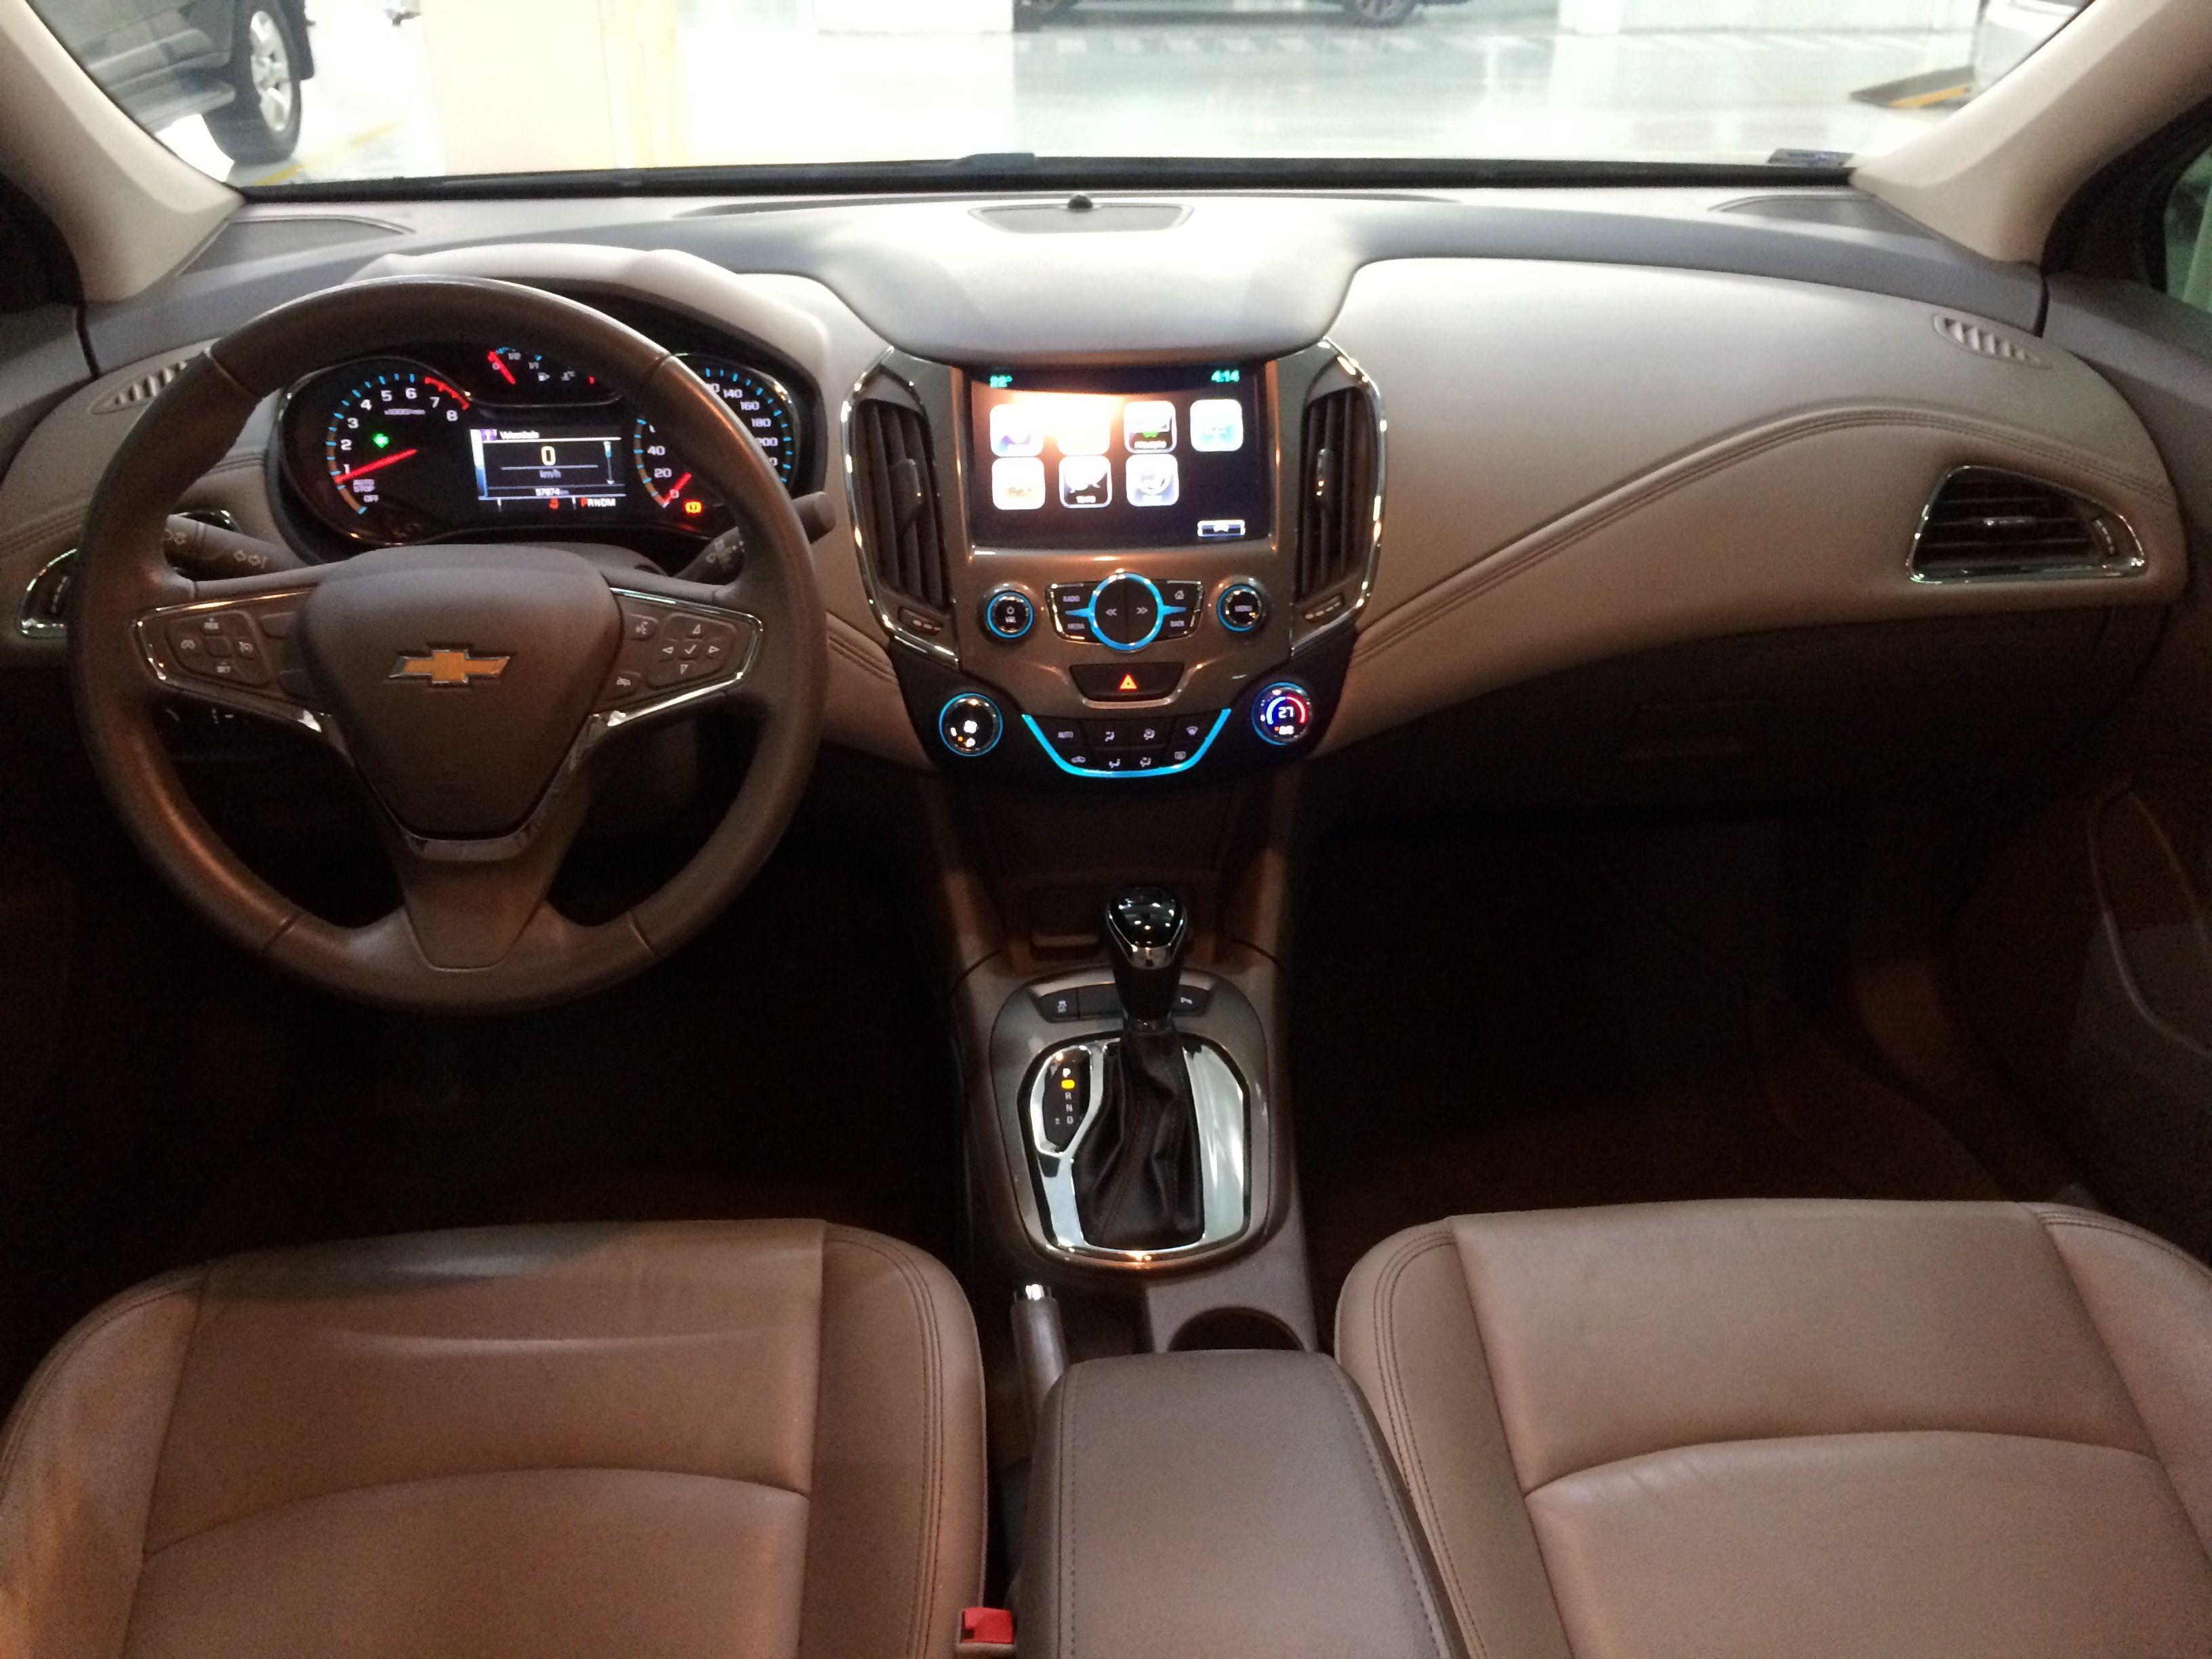 Chevrolet CRUZE LTZ 1.4T 2017